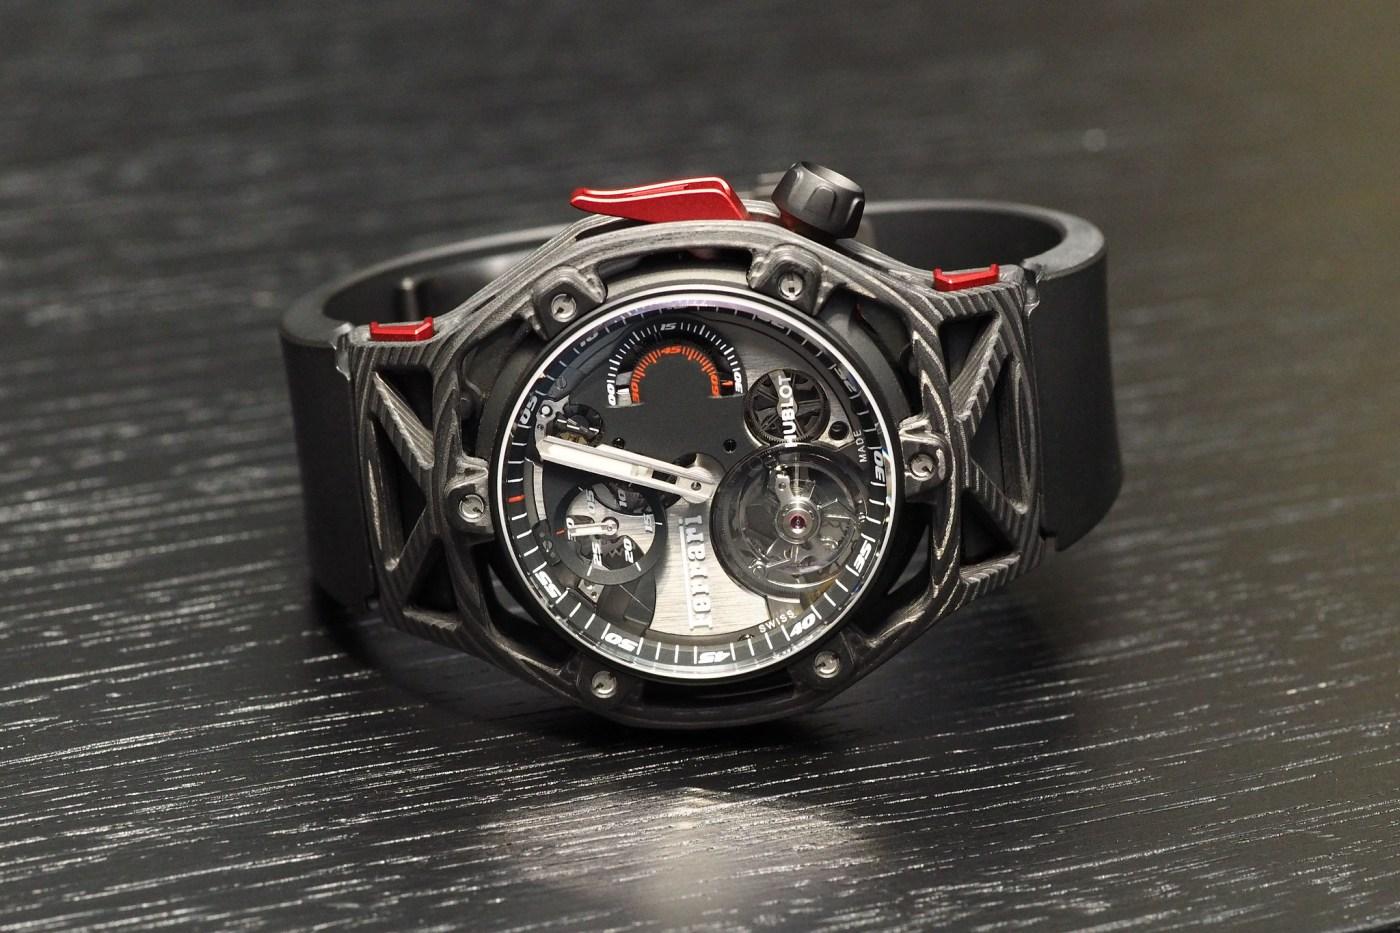 Techframe Ferrari Chronograph side